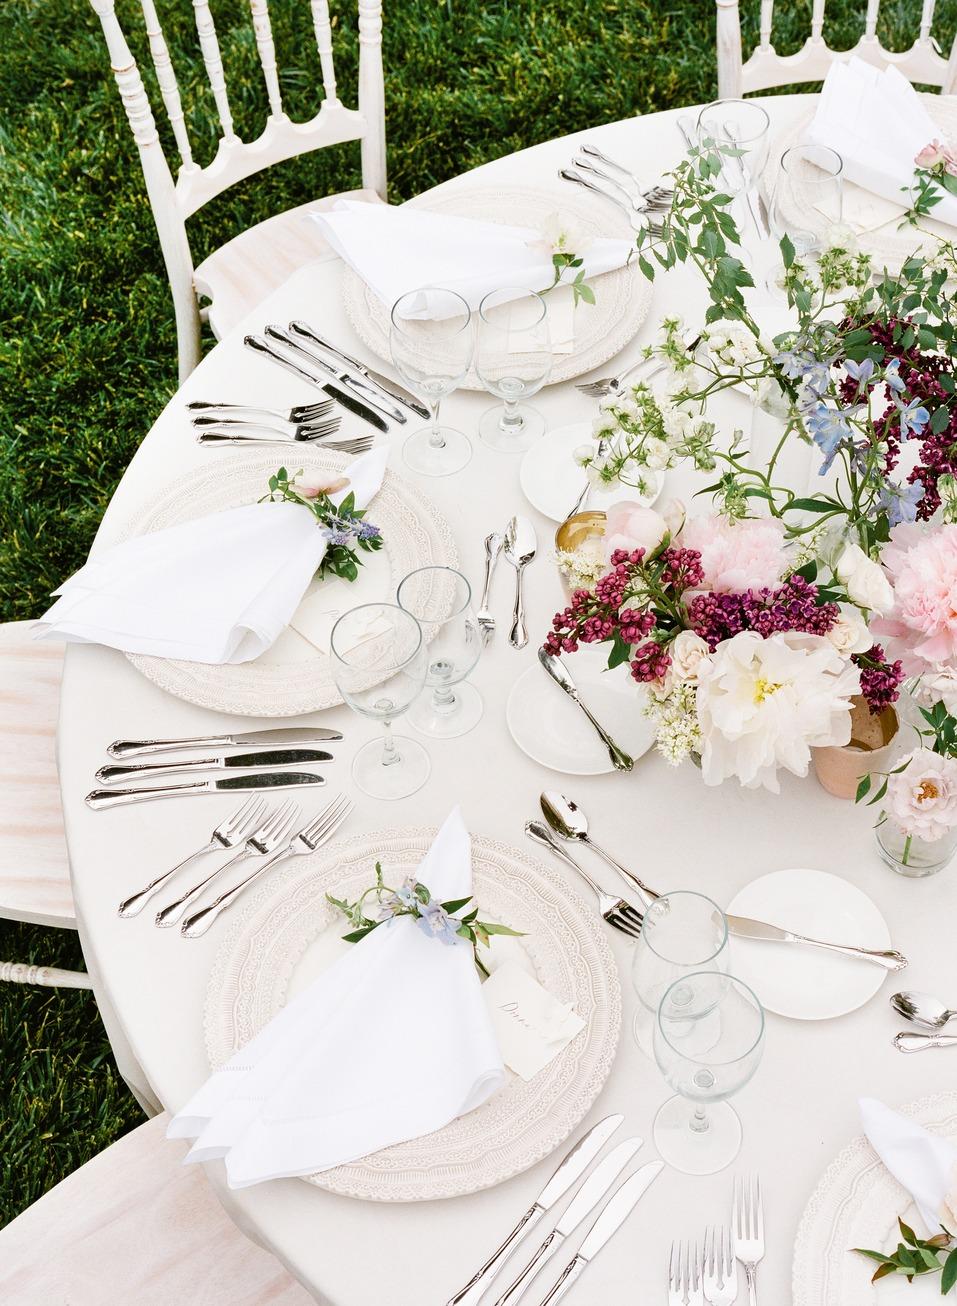 rebecca-clay-wedding-north-carolina-table-103228812.jpg